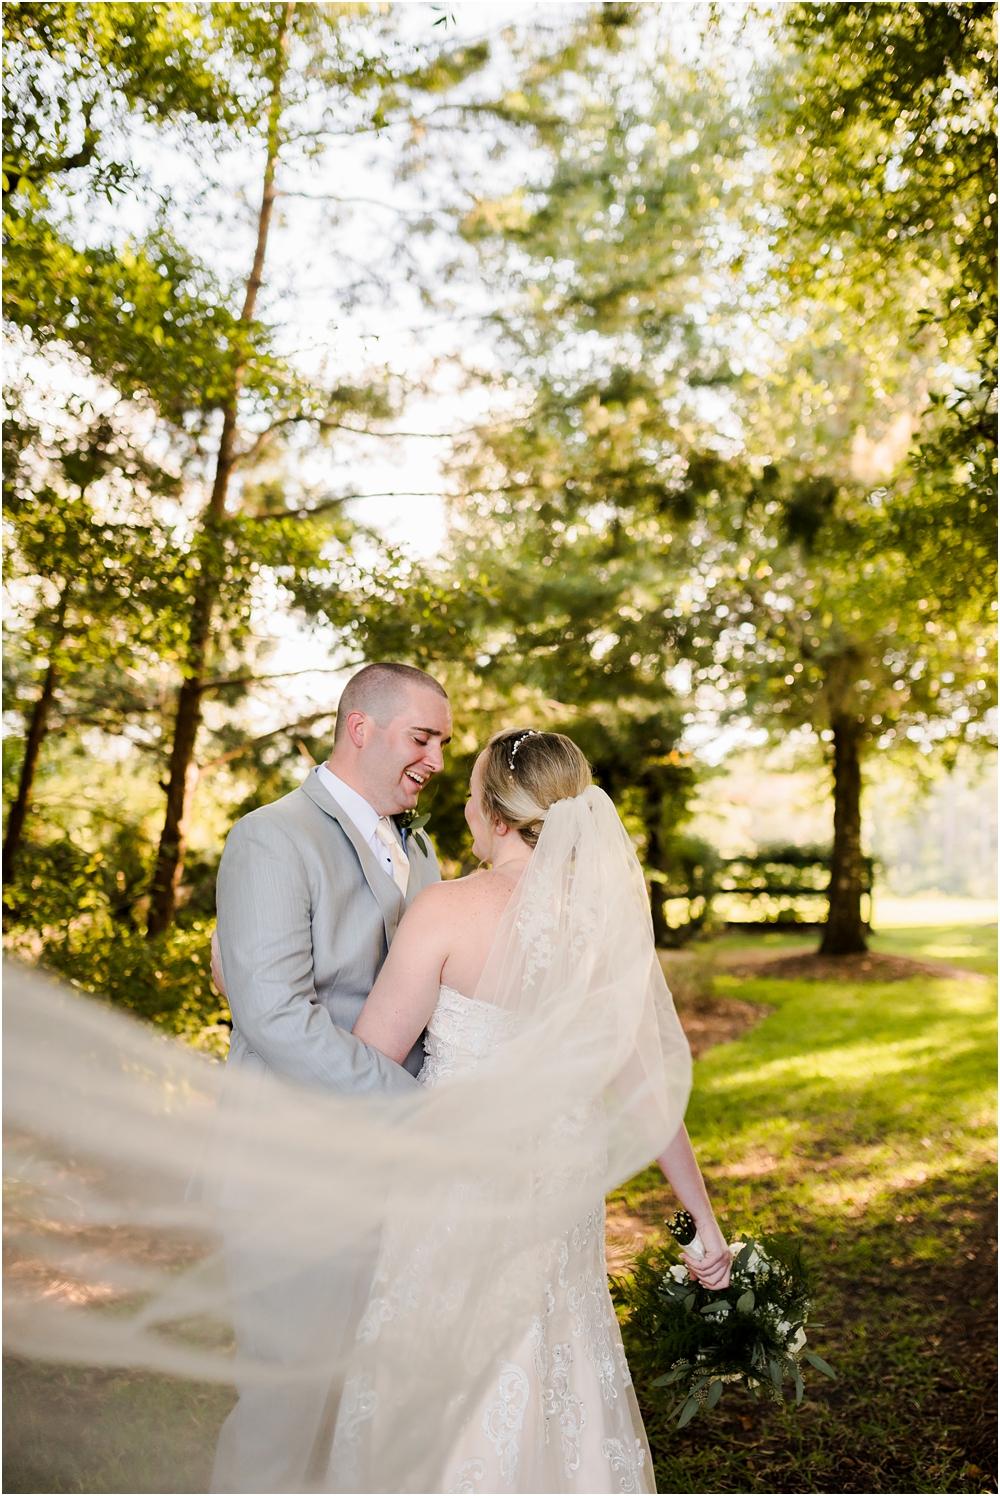 matthew-wedding-kiersten-stevenson-photography-30a-panama-city-beach-dothan-tallahassee-(154-of-579).JPG